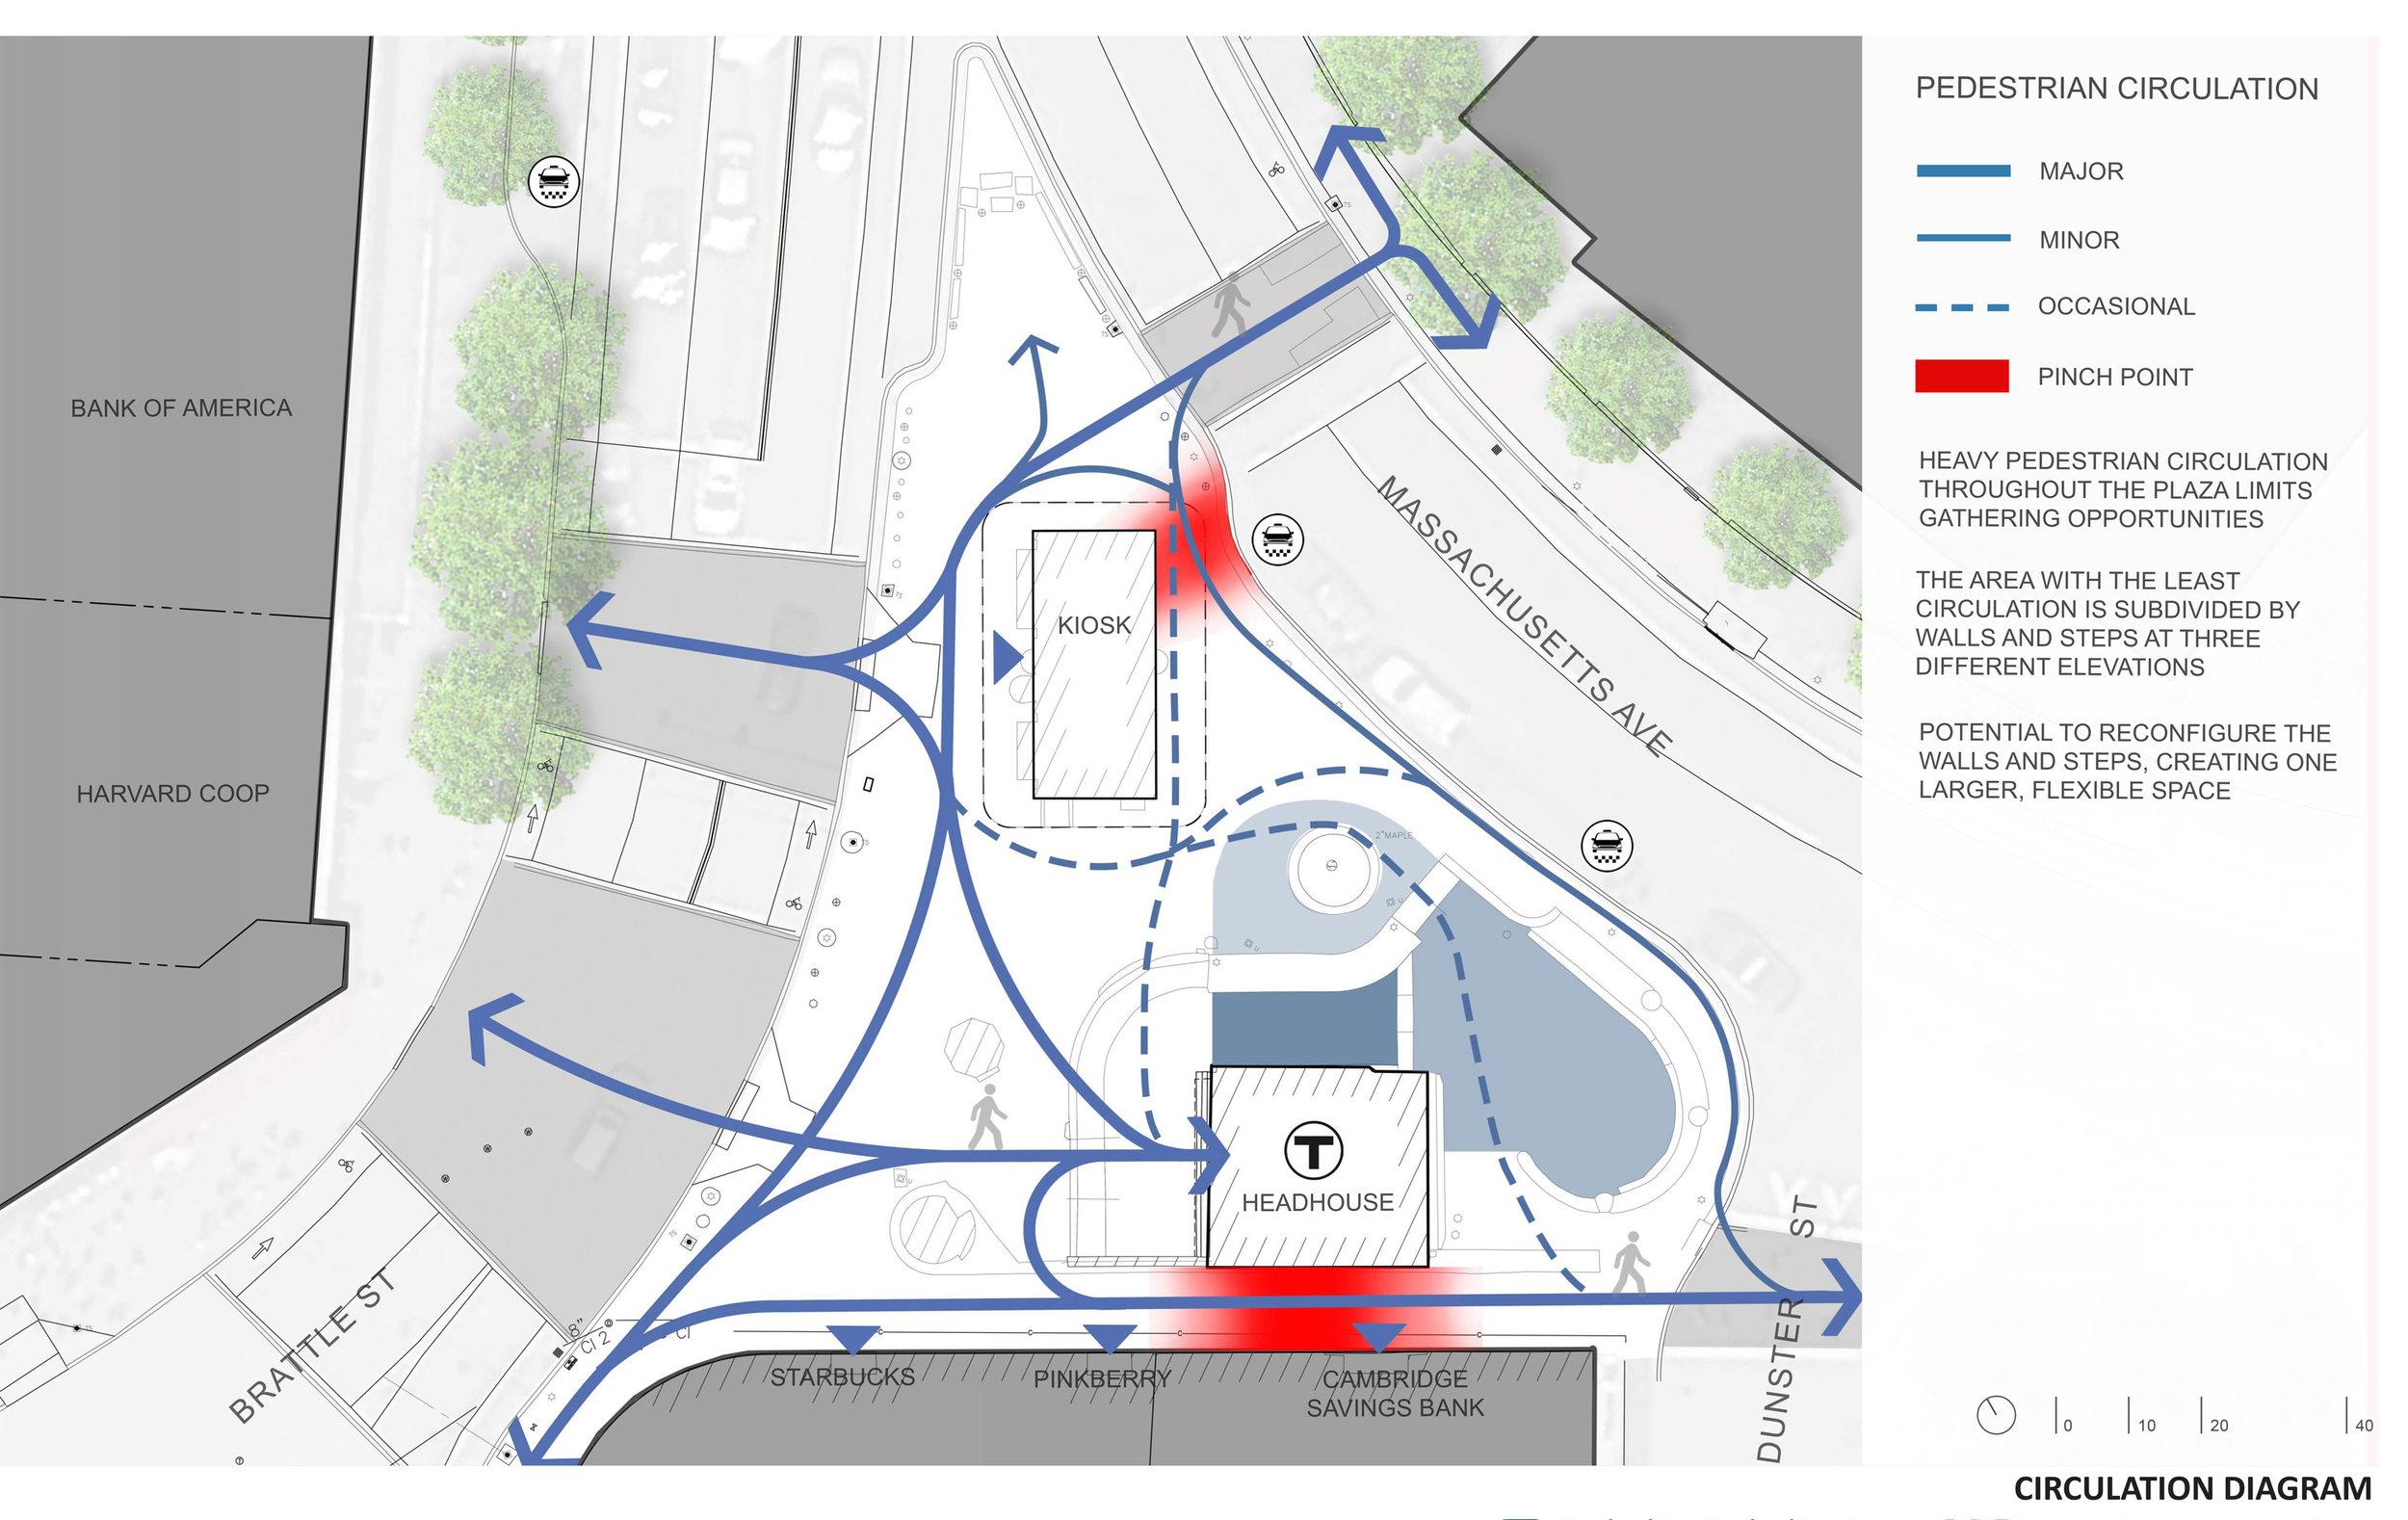 Harvard Square Plaza Pedestrian Circulation Diagram (Halvorson Design)